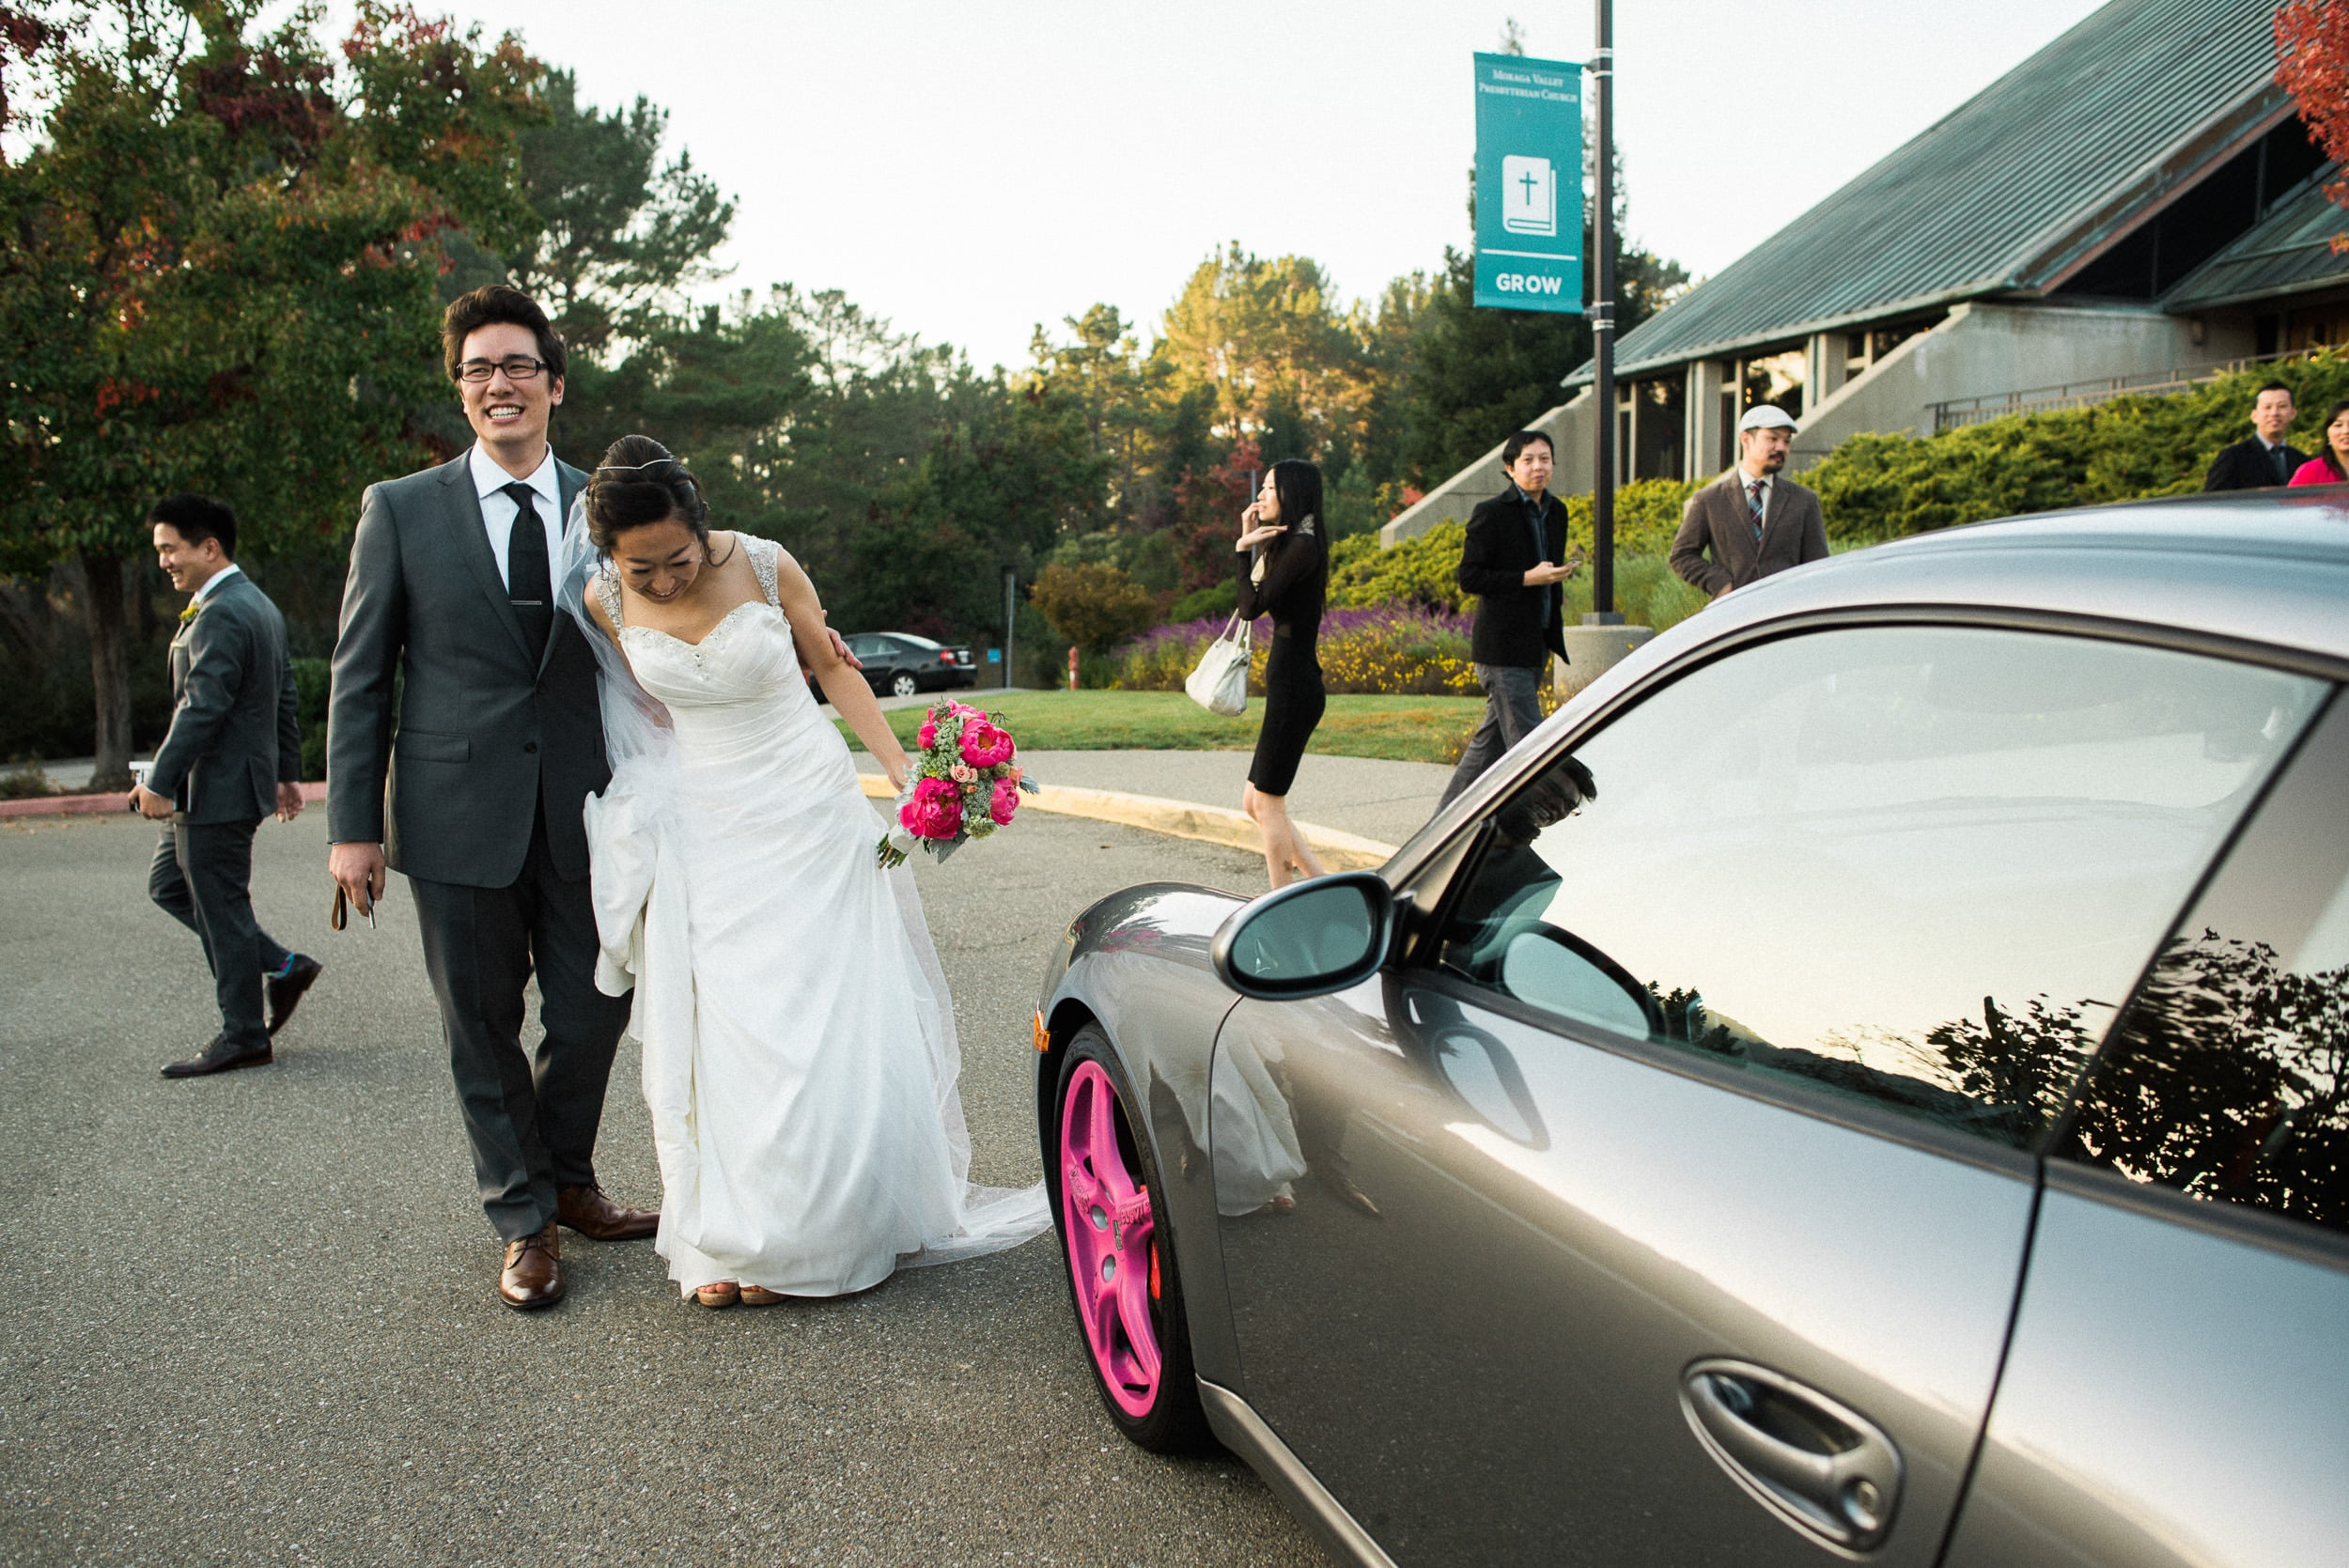 Moraga Valley Church wedding 058.jpg